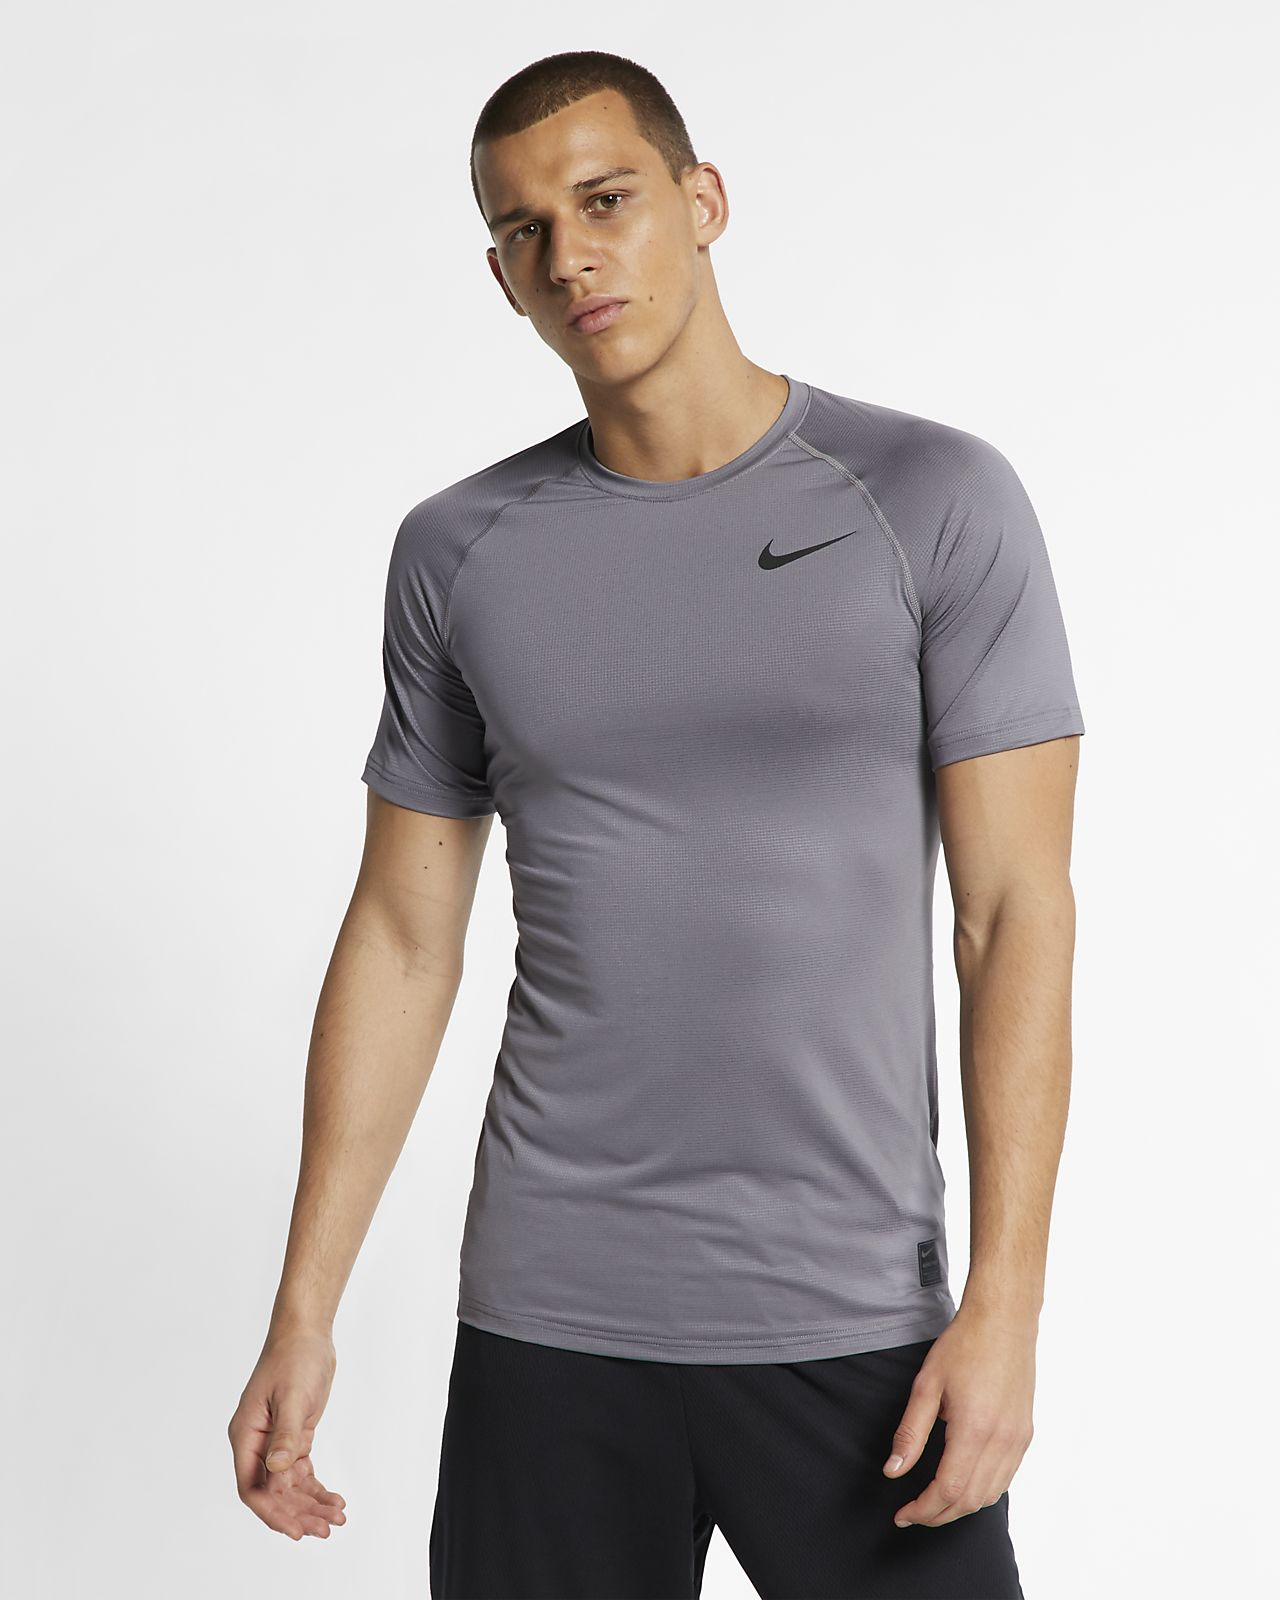 Kortärmad tröja Nike Breathe Pro för män